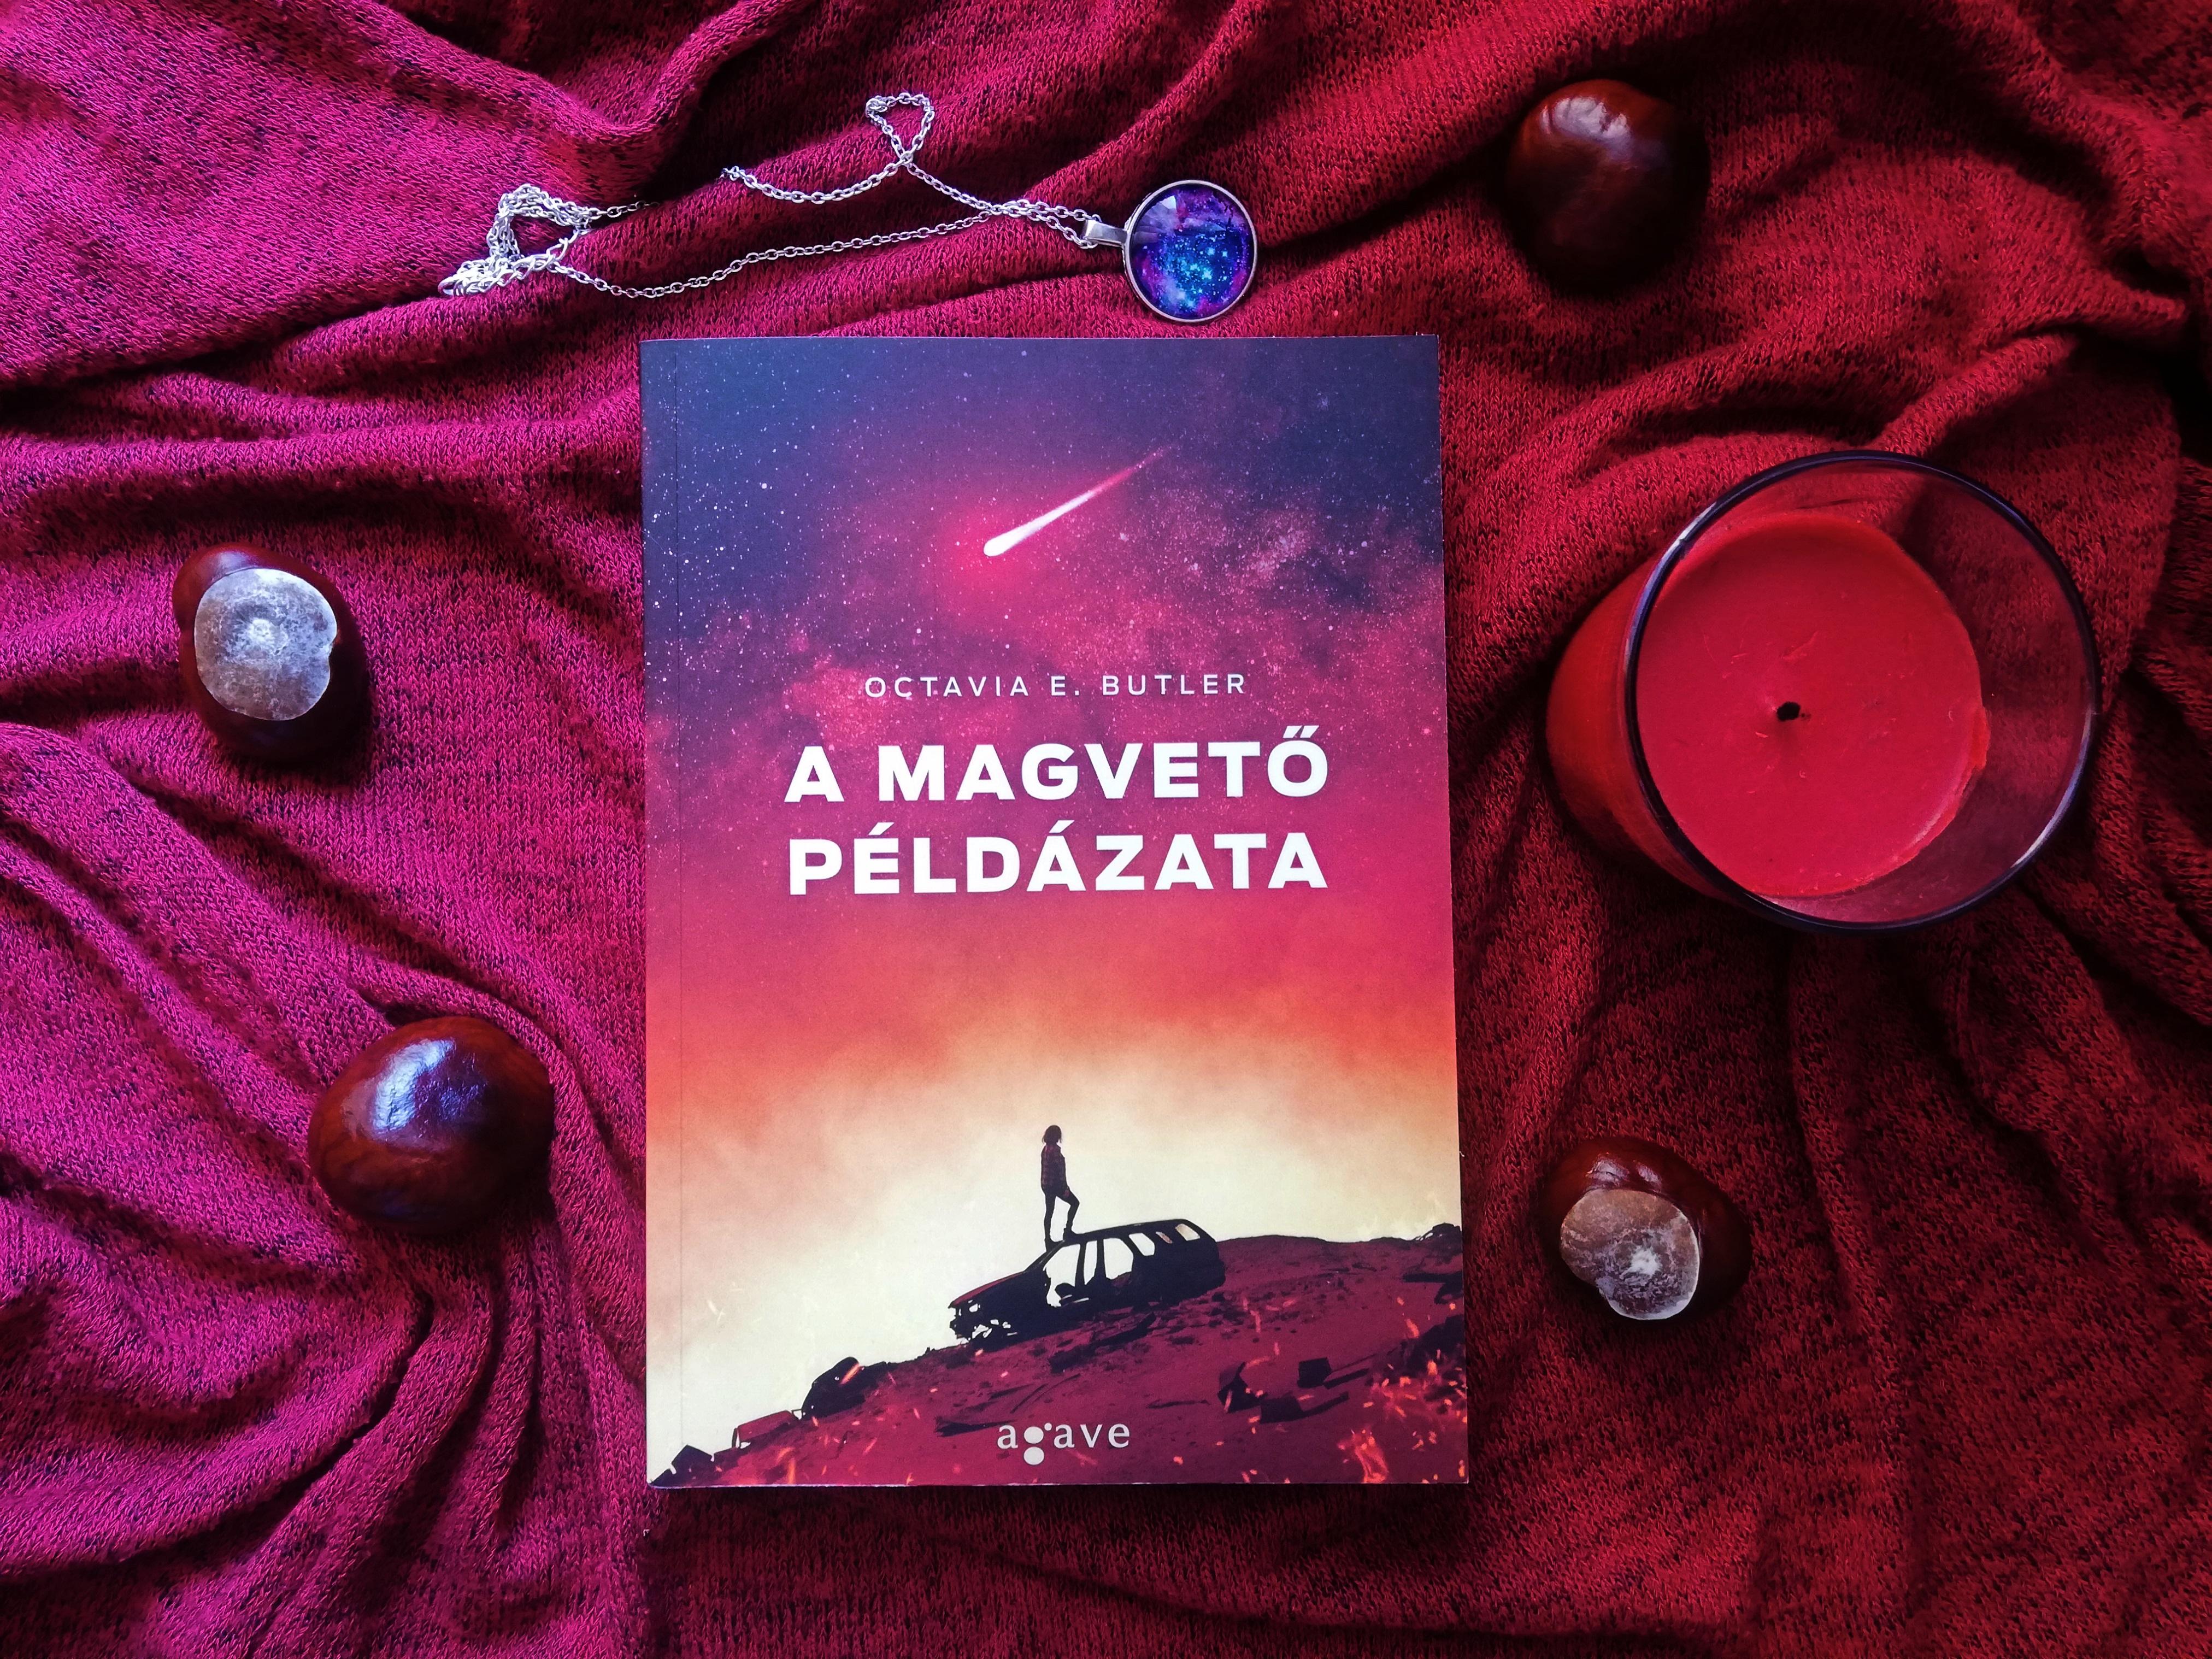 img_a_magveto_peldazata_blog.jpg